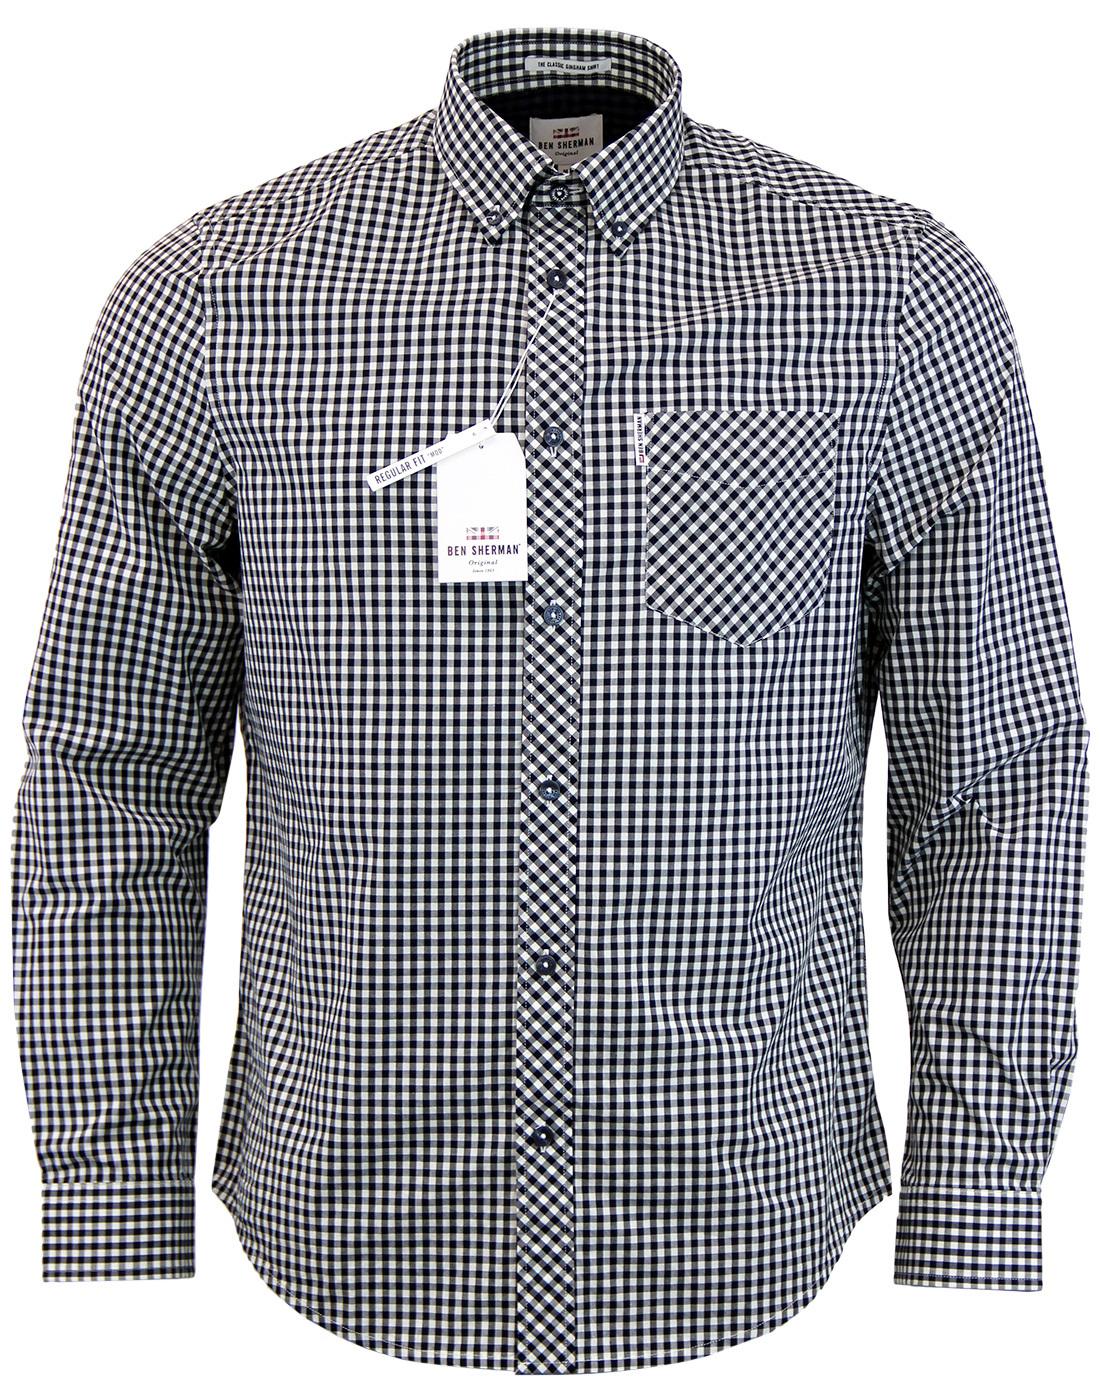 BEN SHERMAN Retro Mod 60s Gingham Shirt - Black